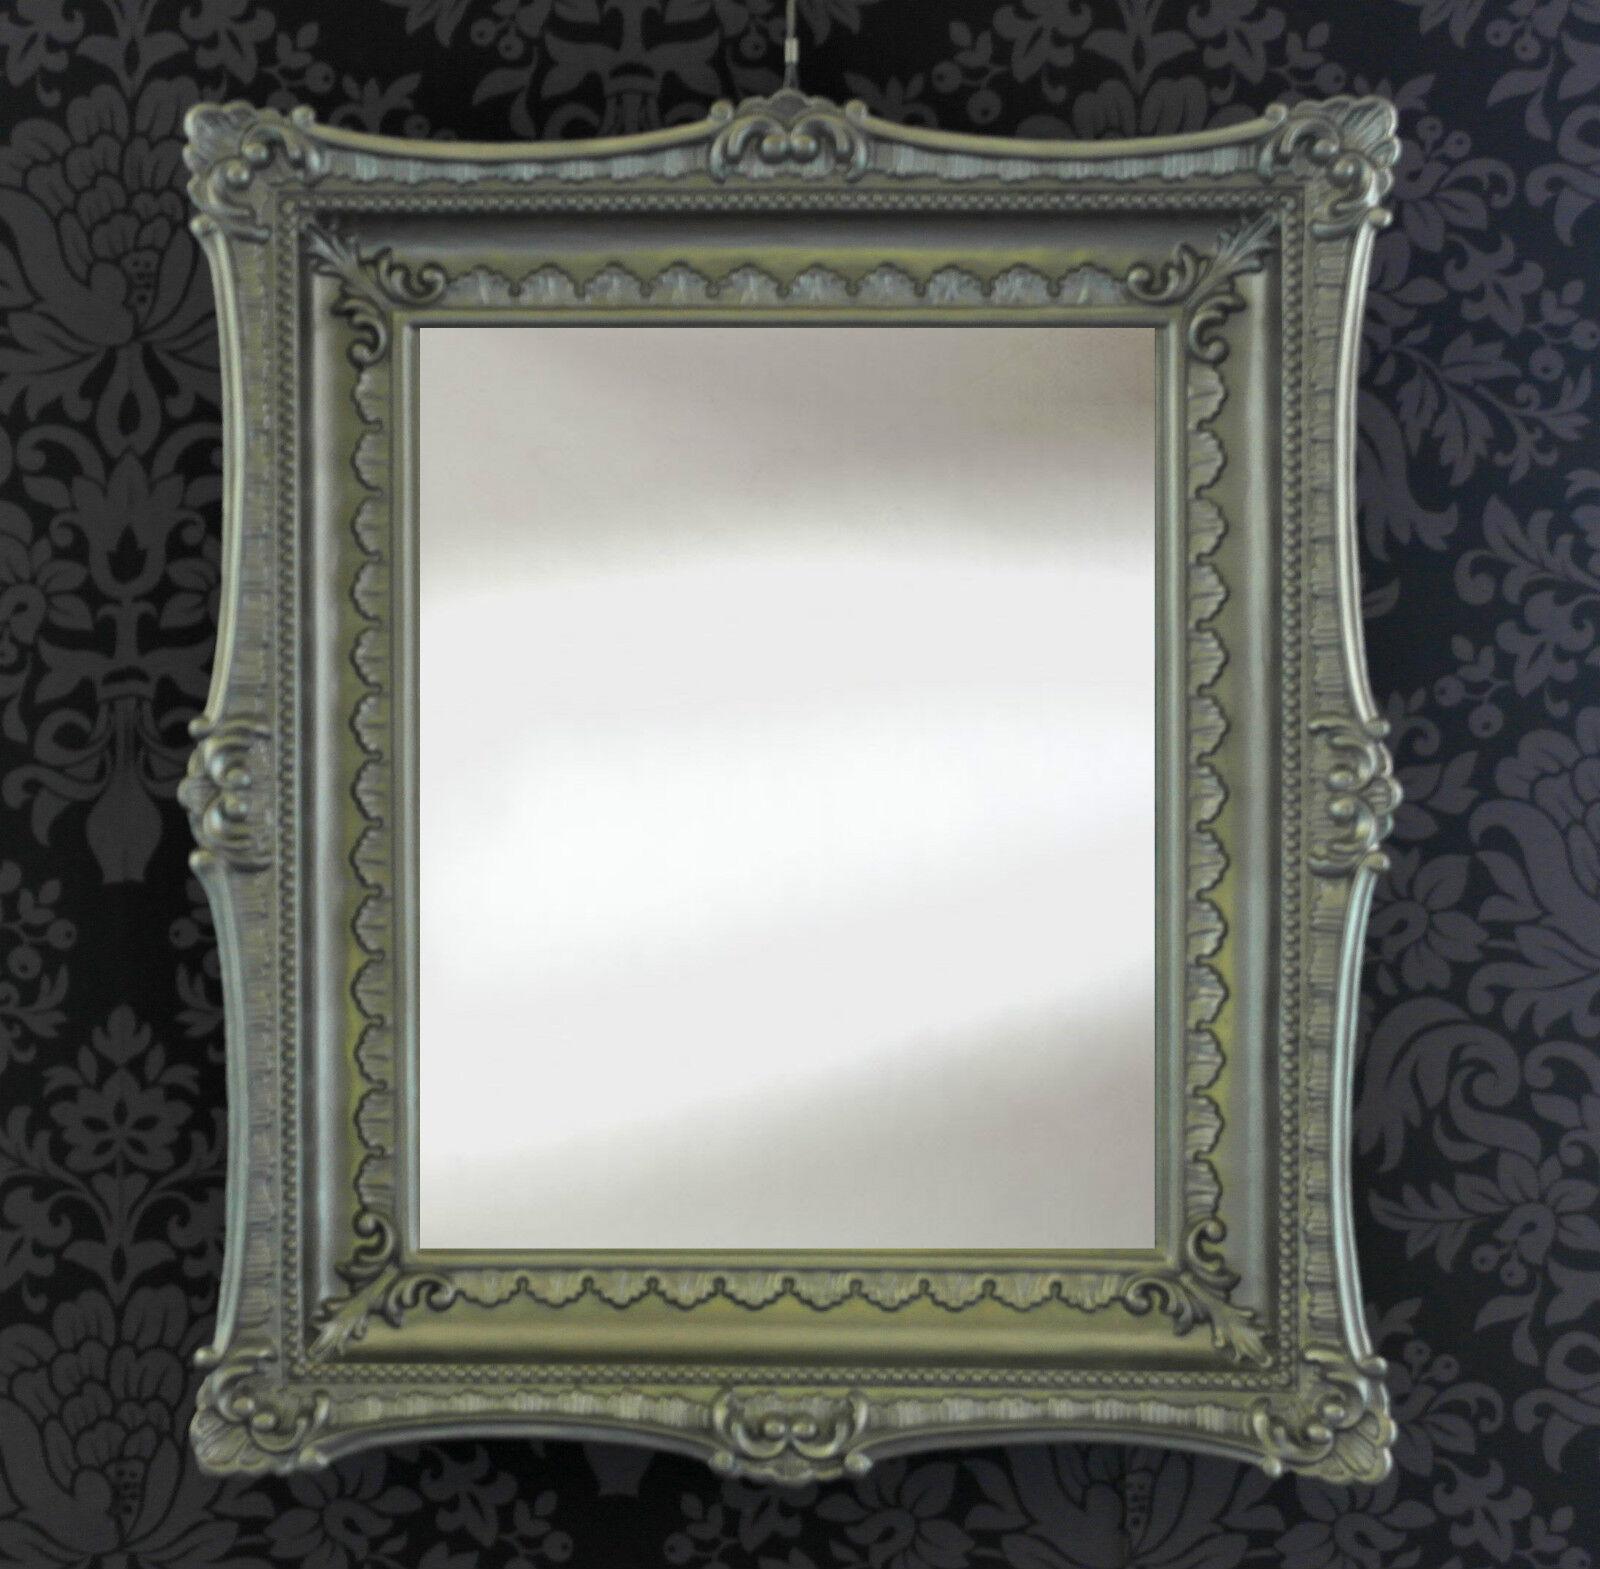 wandspiegel antik rokoko 70x60 barock repro altsilber antiksilber spiegel neu ebay. Black Bedroom Furniture Sets. Home Design Ideas